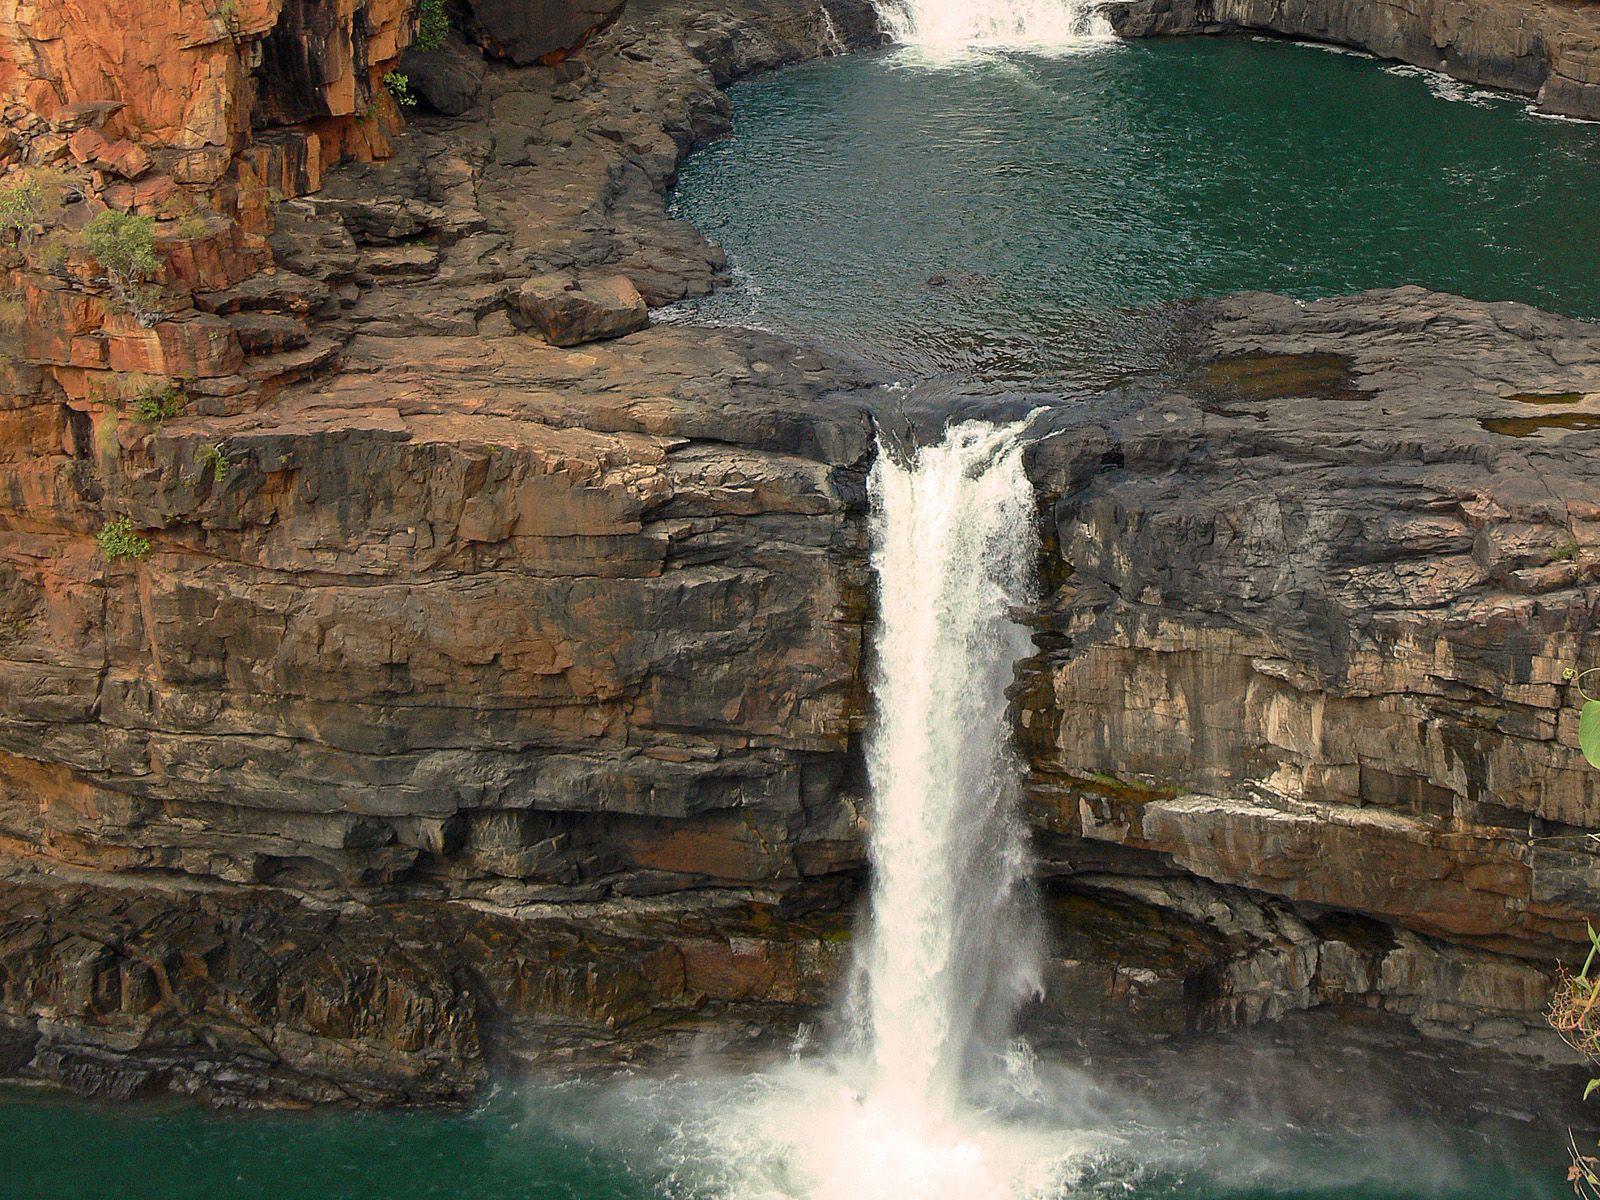 Нижний каскад водопада Митчелл